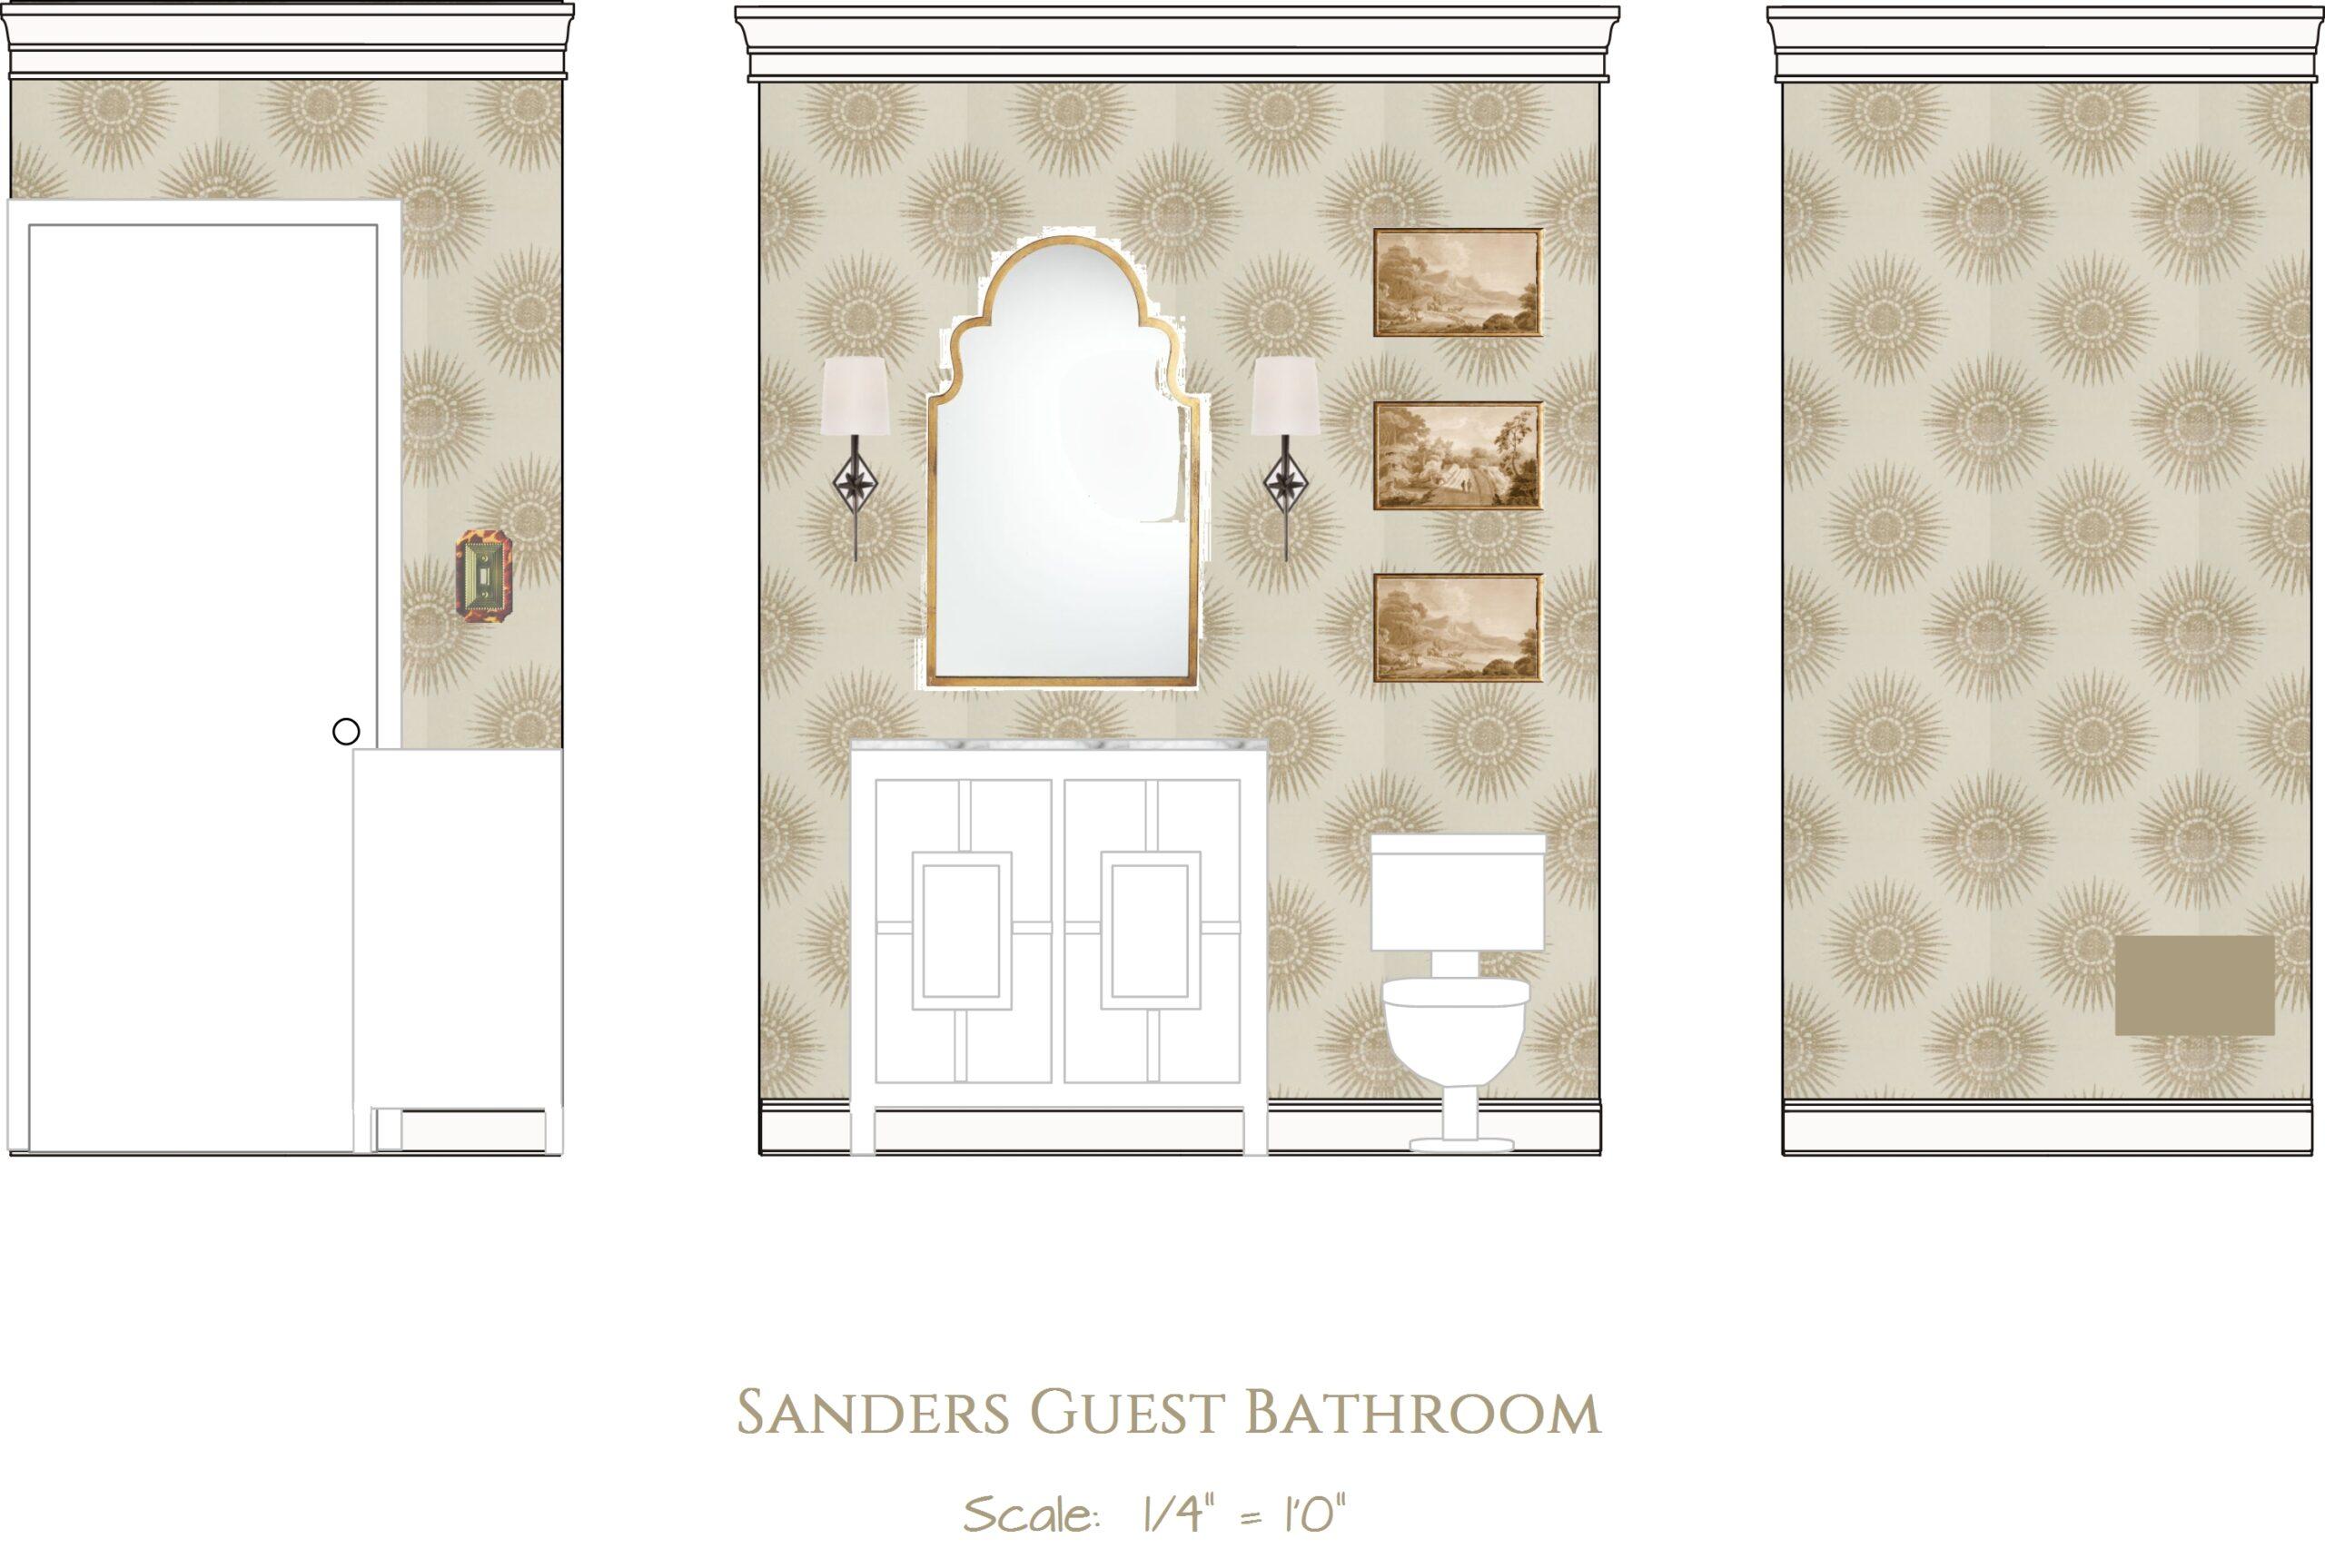 2D Rendering of Bathroom Renovation Elevation